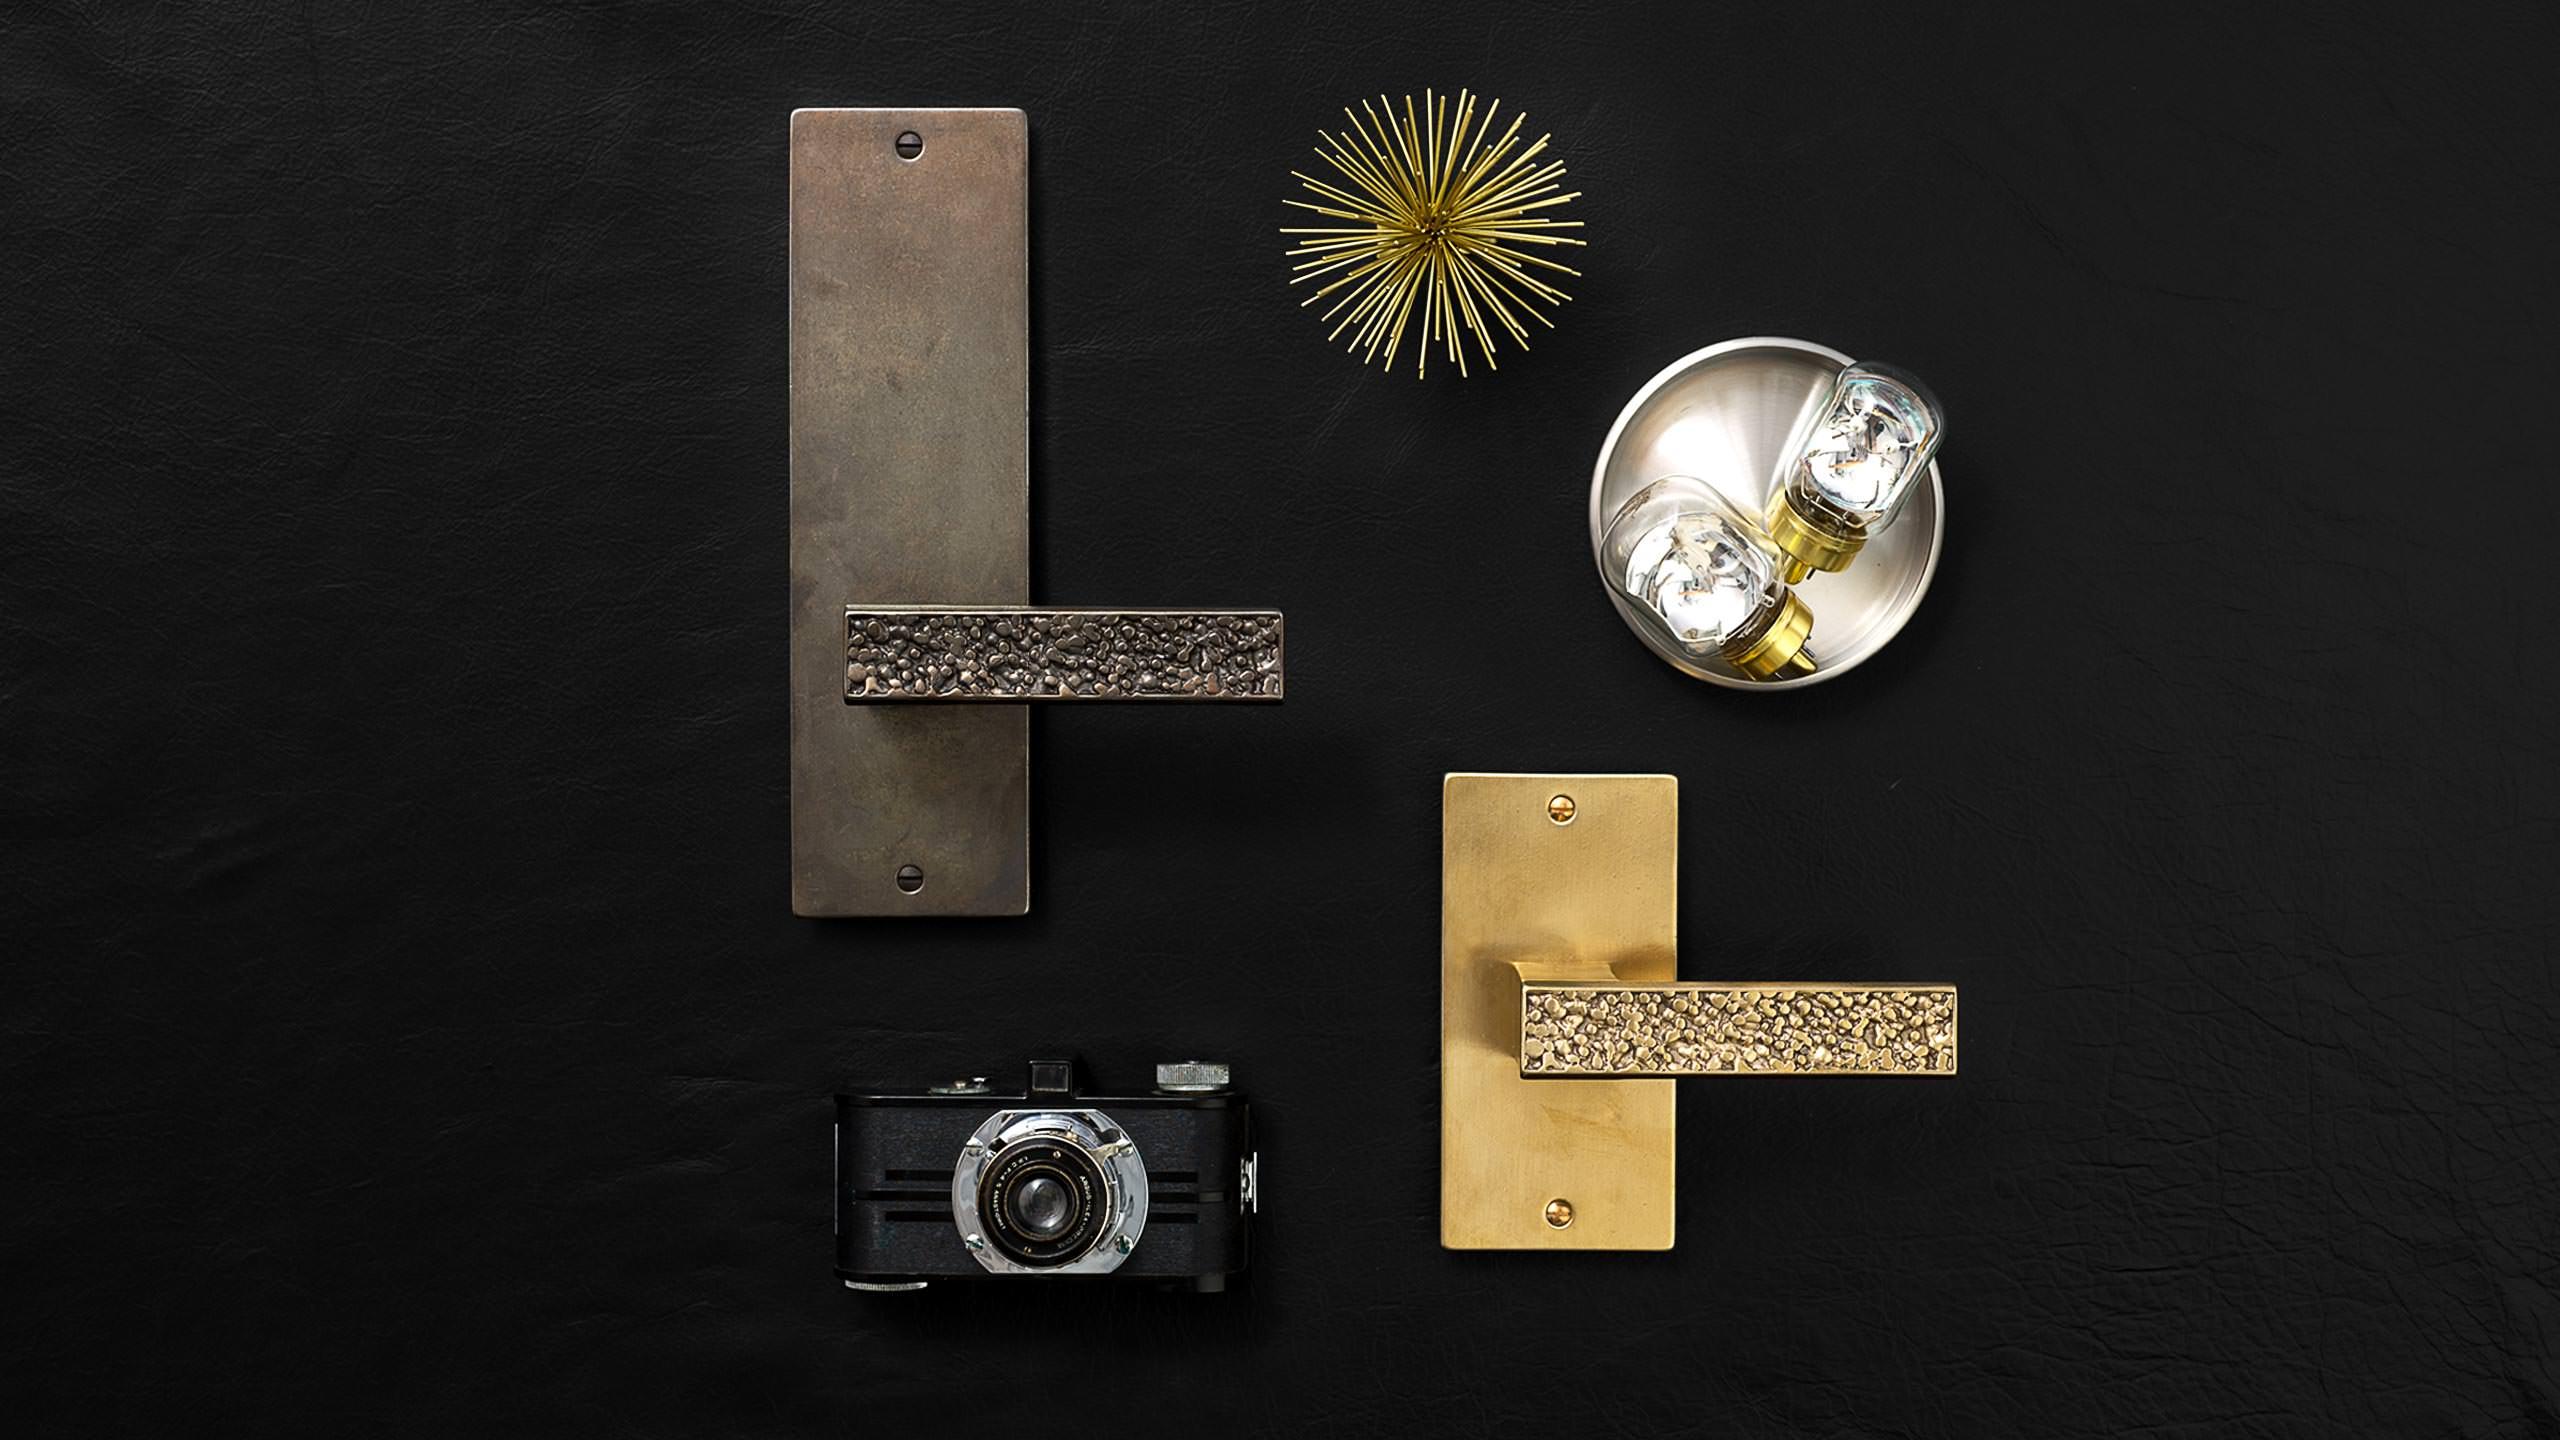 rocky-mountain-hardware-interactive-photograph-lenny-kravitz-wide